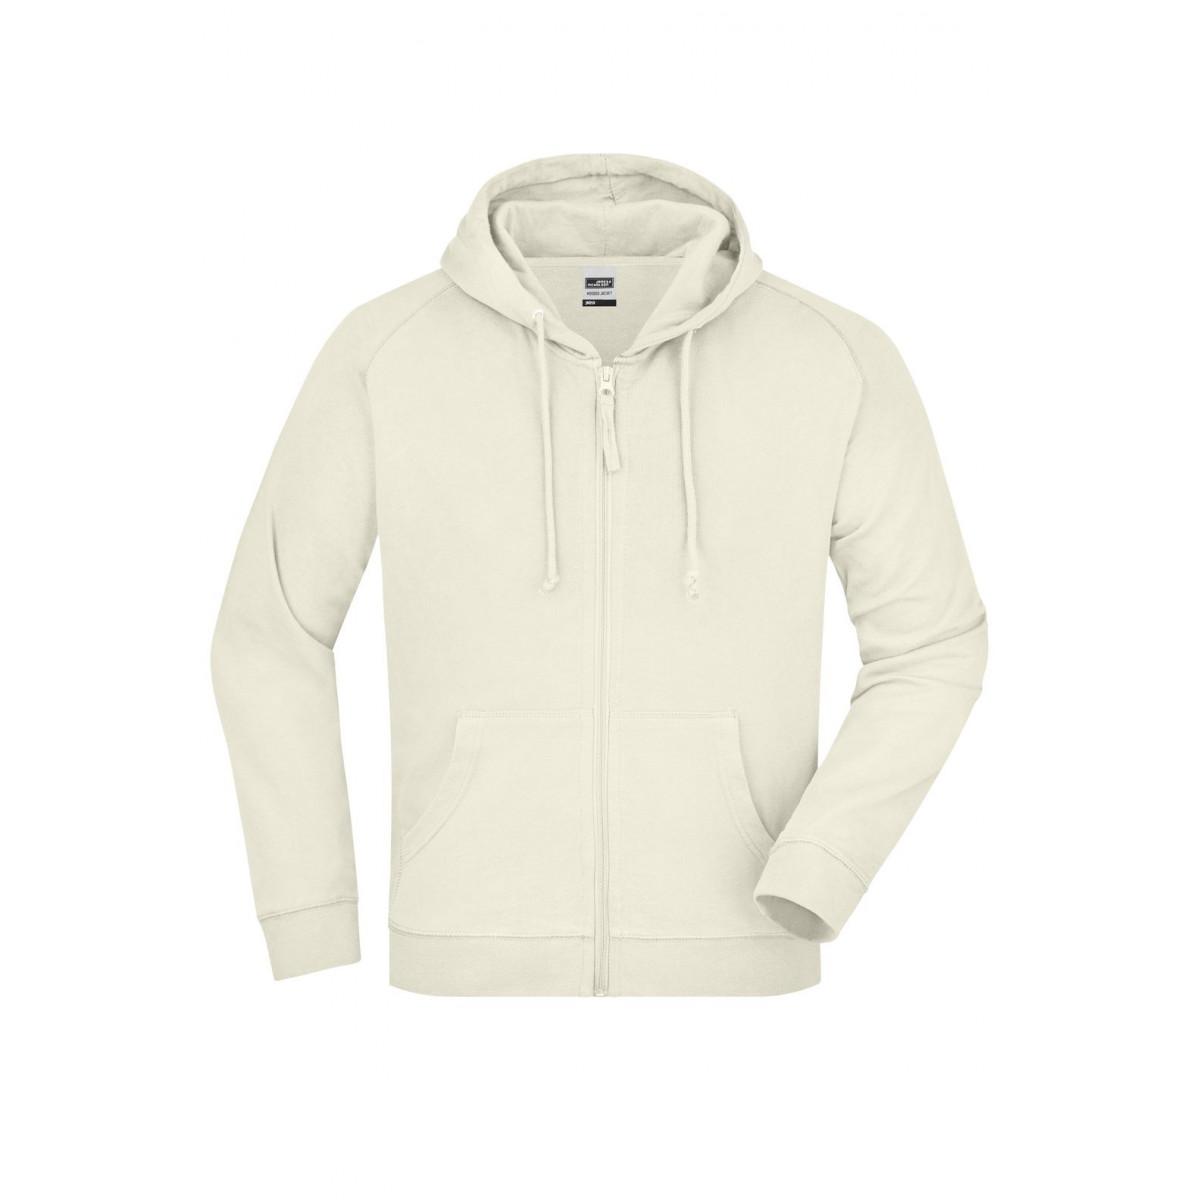 Толстовка мужская JN059 Hooded Jacket - Бежевый